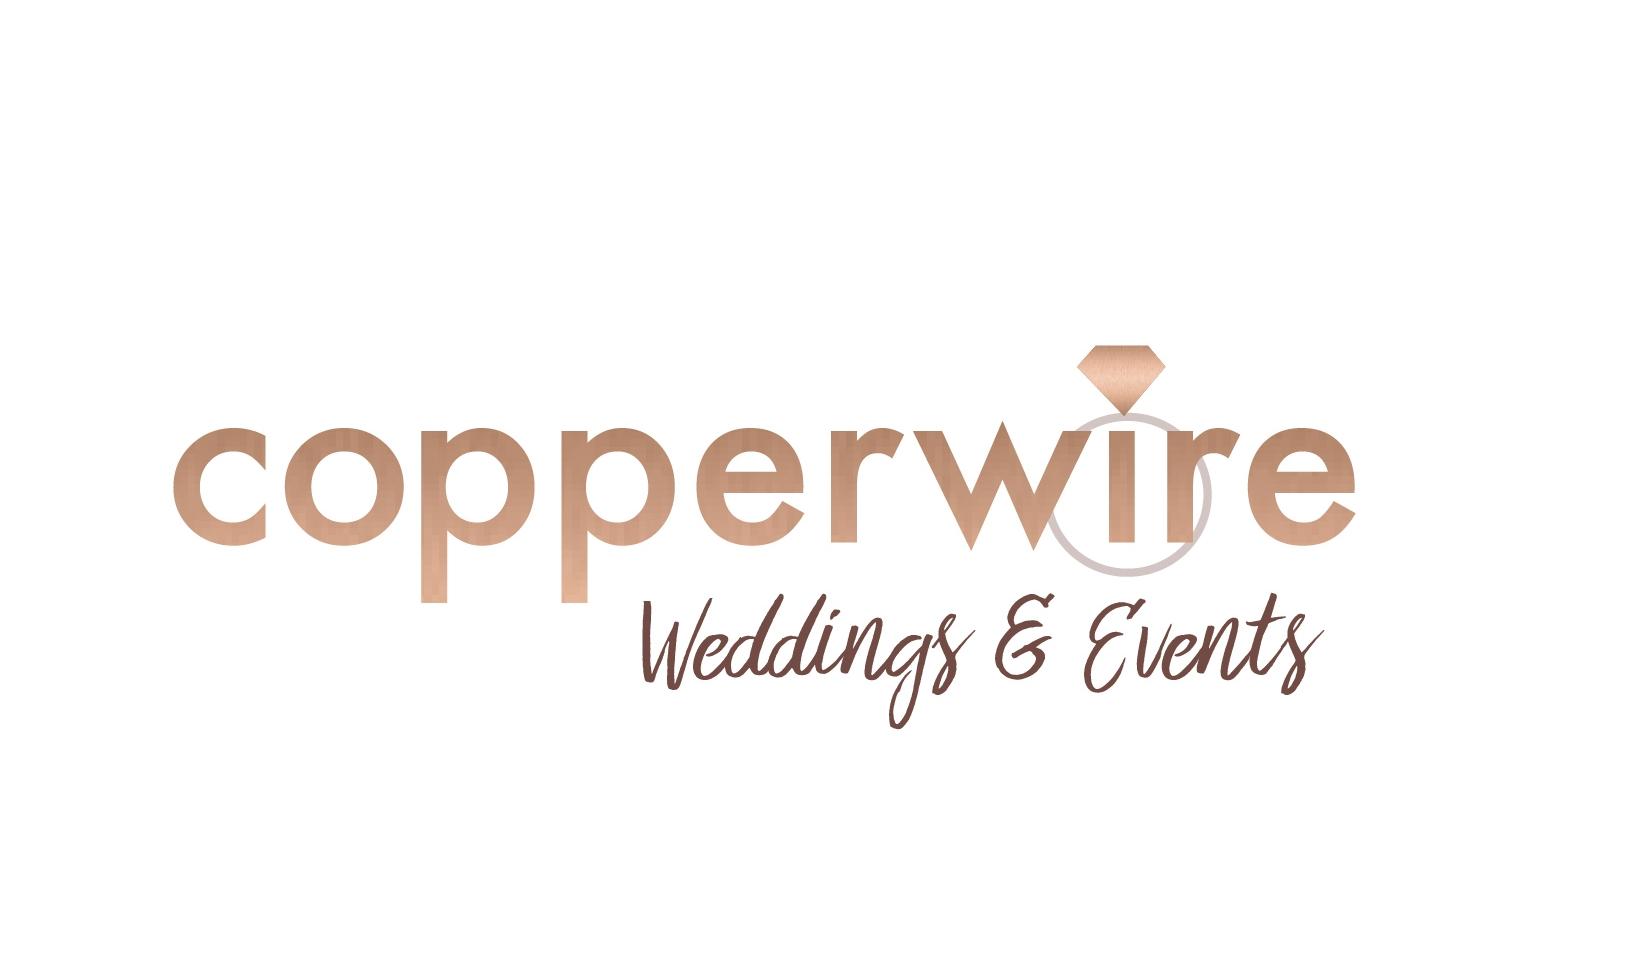 copperwire3.jpg